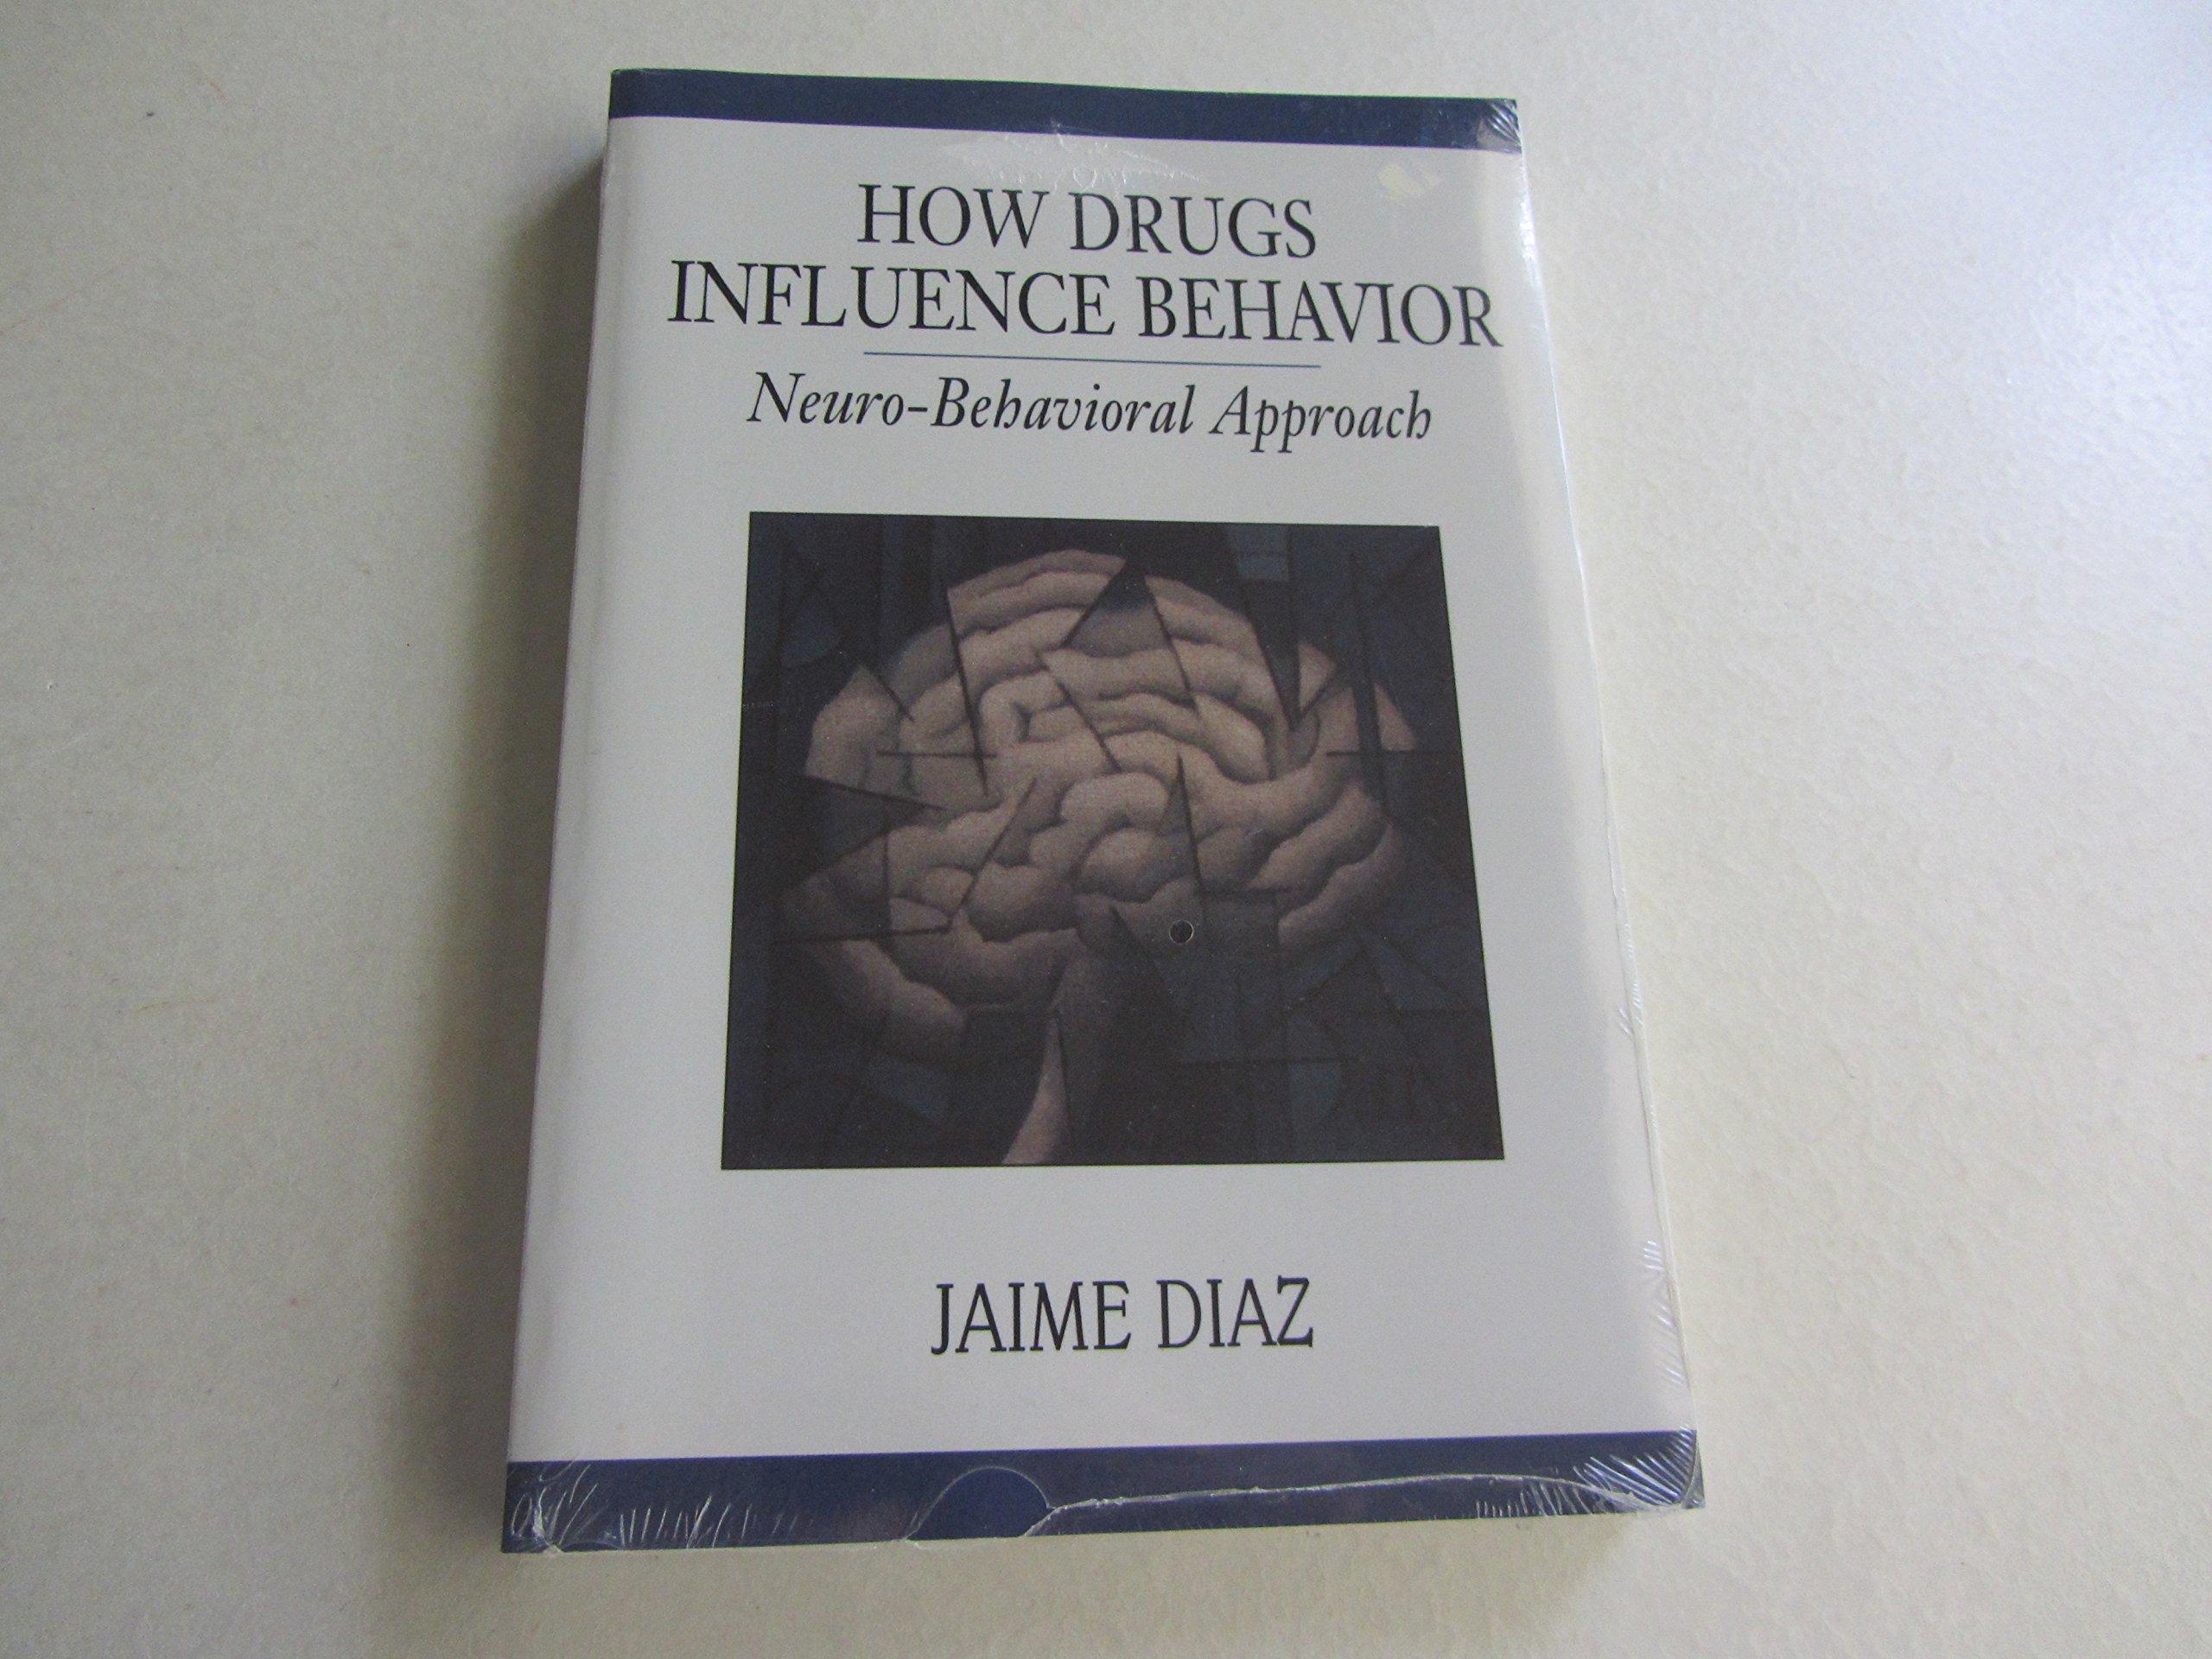 How Drugs Influence Behavior: A Neurobehavioral Approach